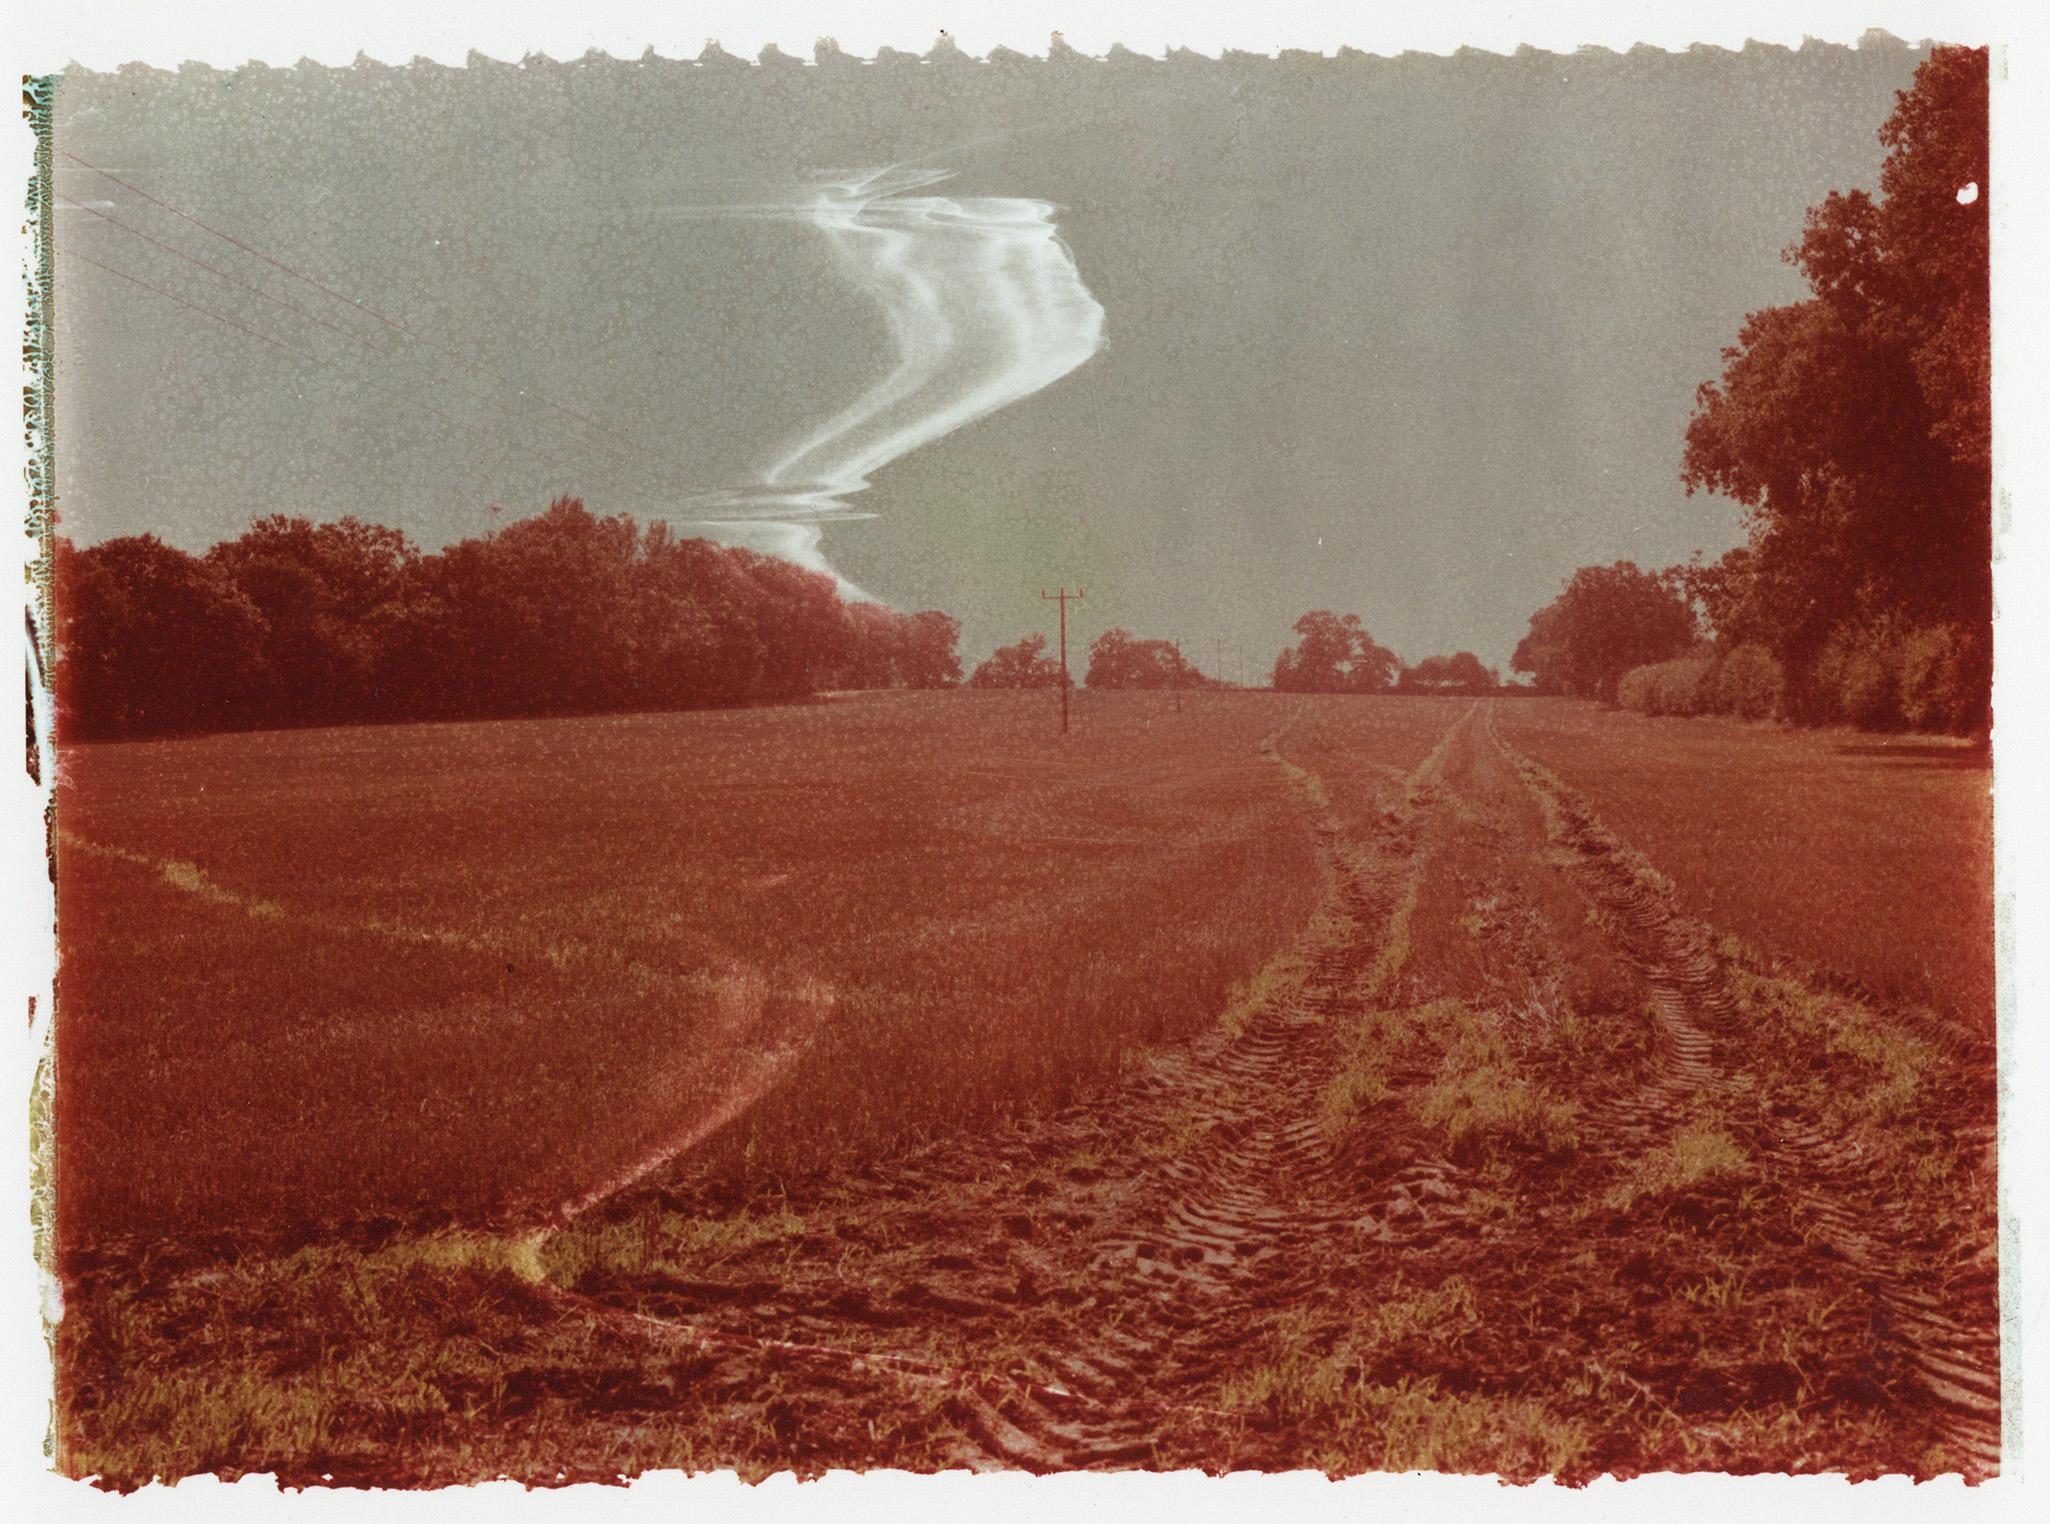 terra #002 - Andrea Morley